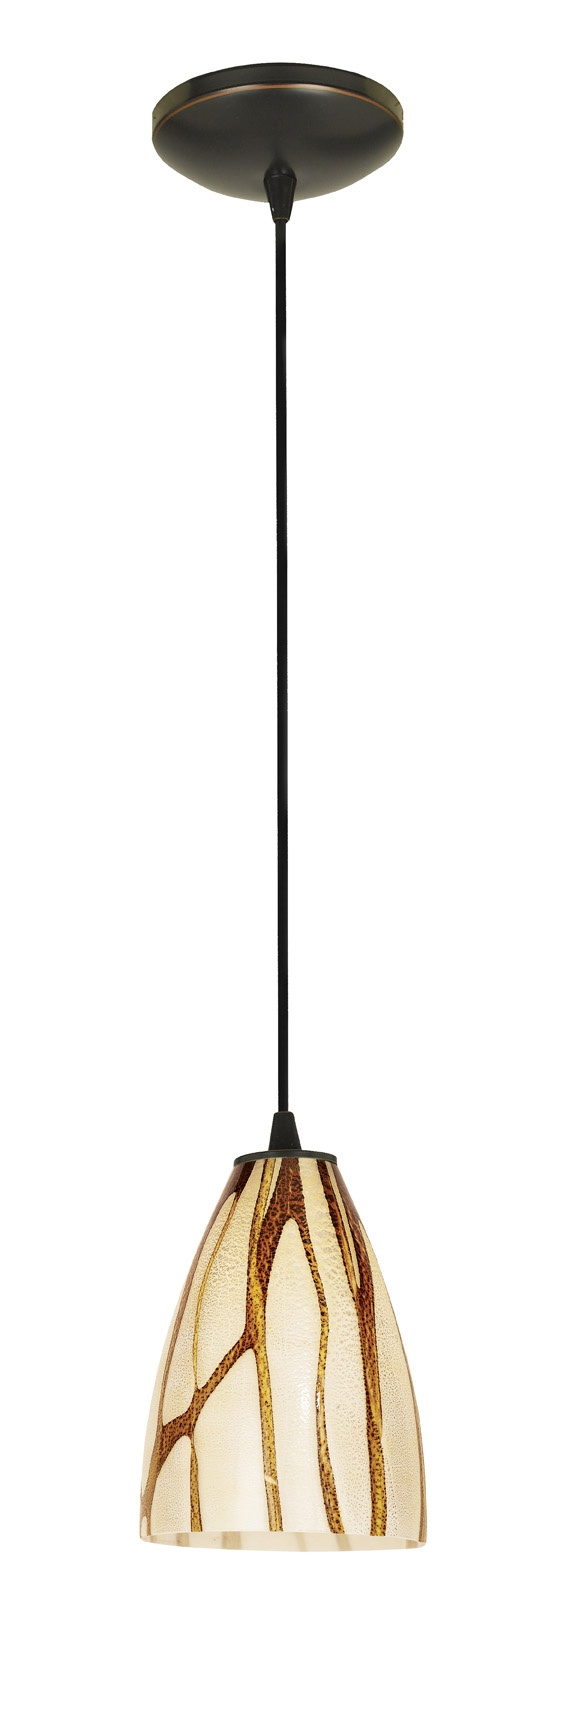 23 best kitchen pendant lighting images on pinterest kitchen